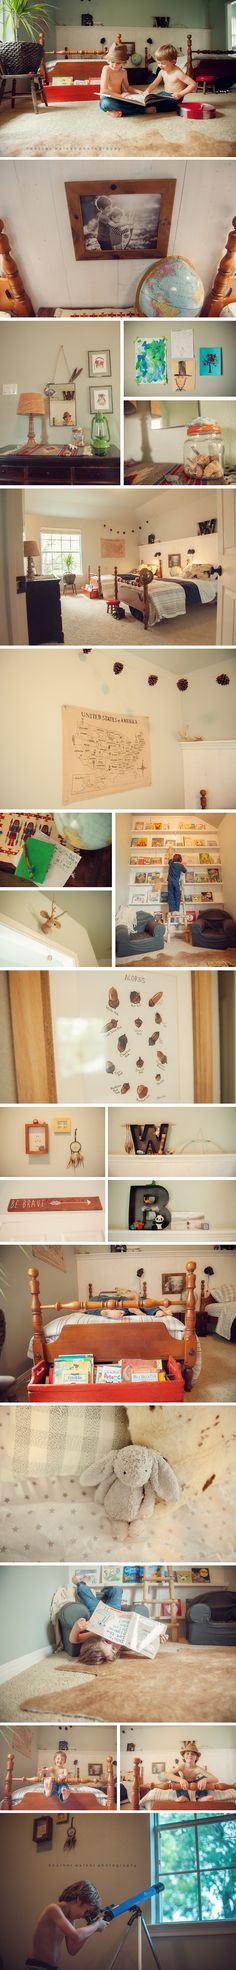 Boys Room Makeover Ideas! Boys room, decor inspiration.